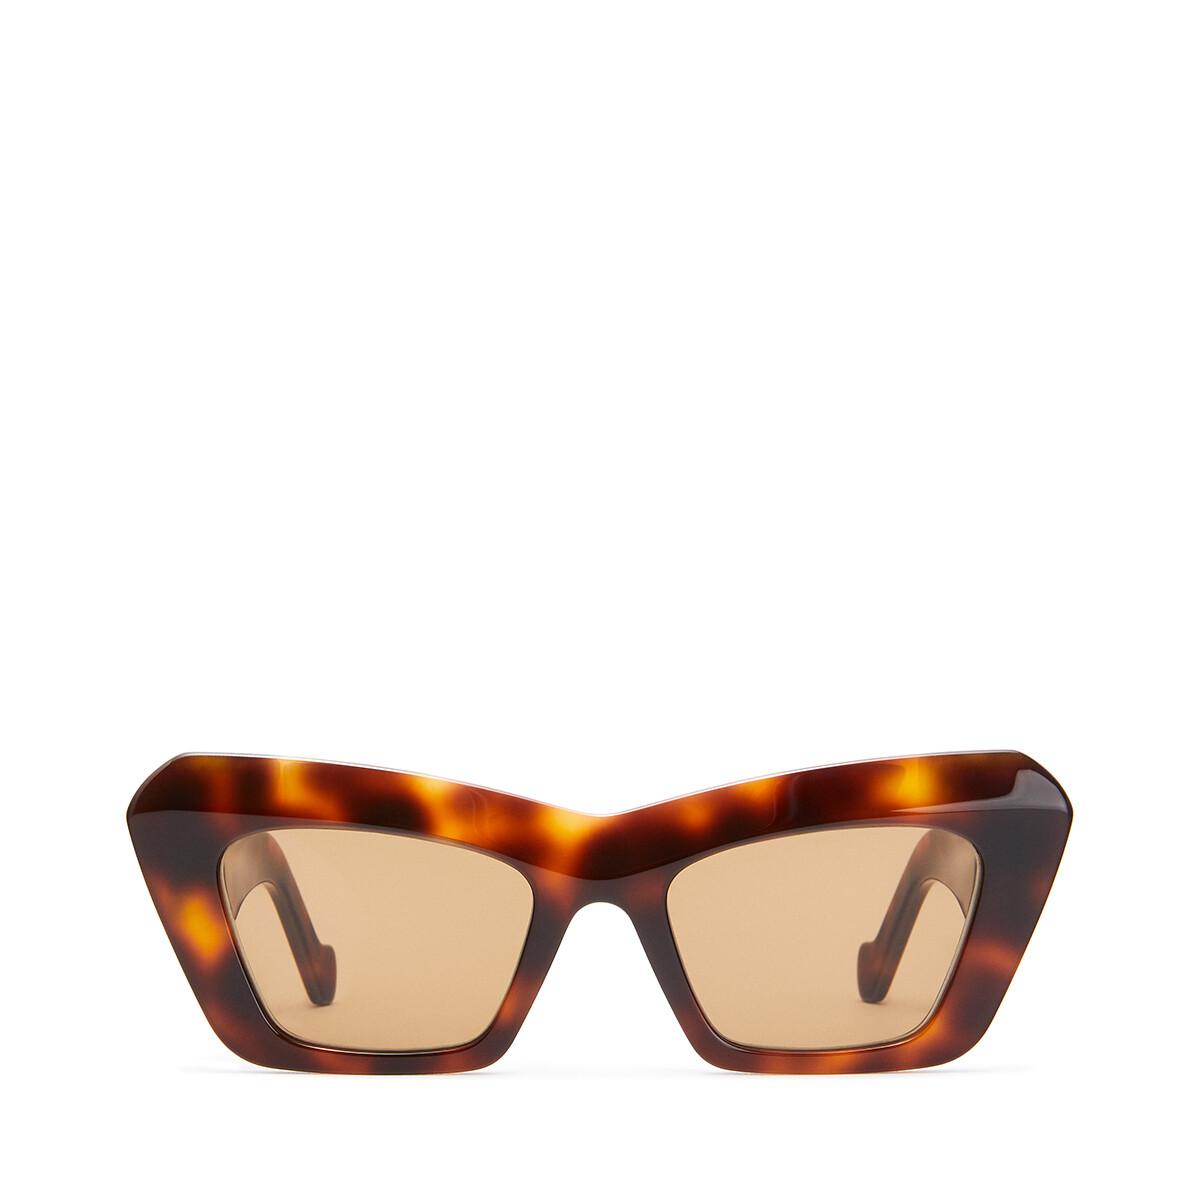 LOEWE Acetate Cateye Sunglasses Havana front